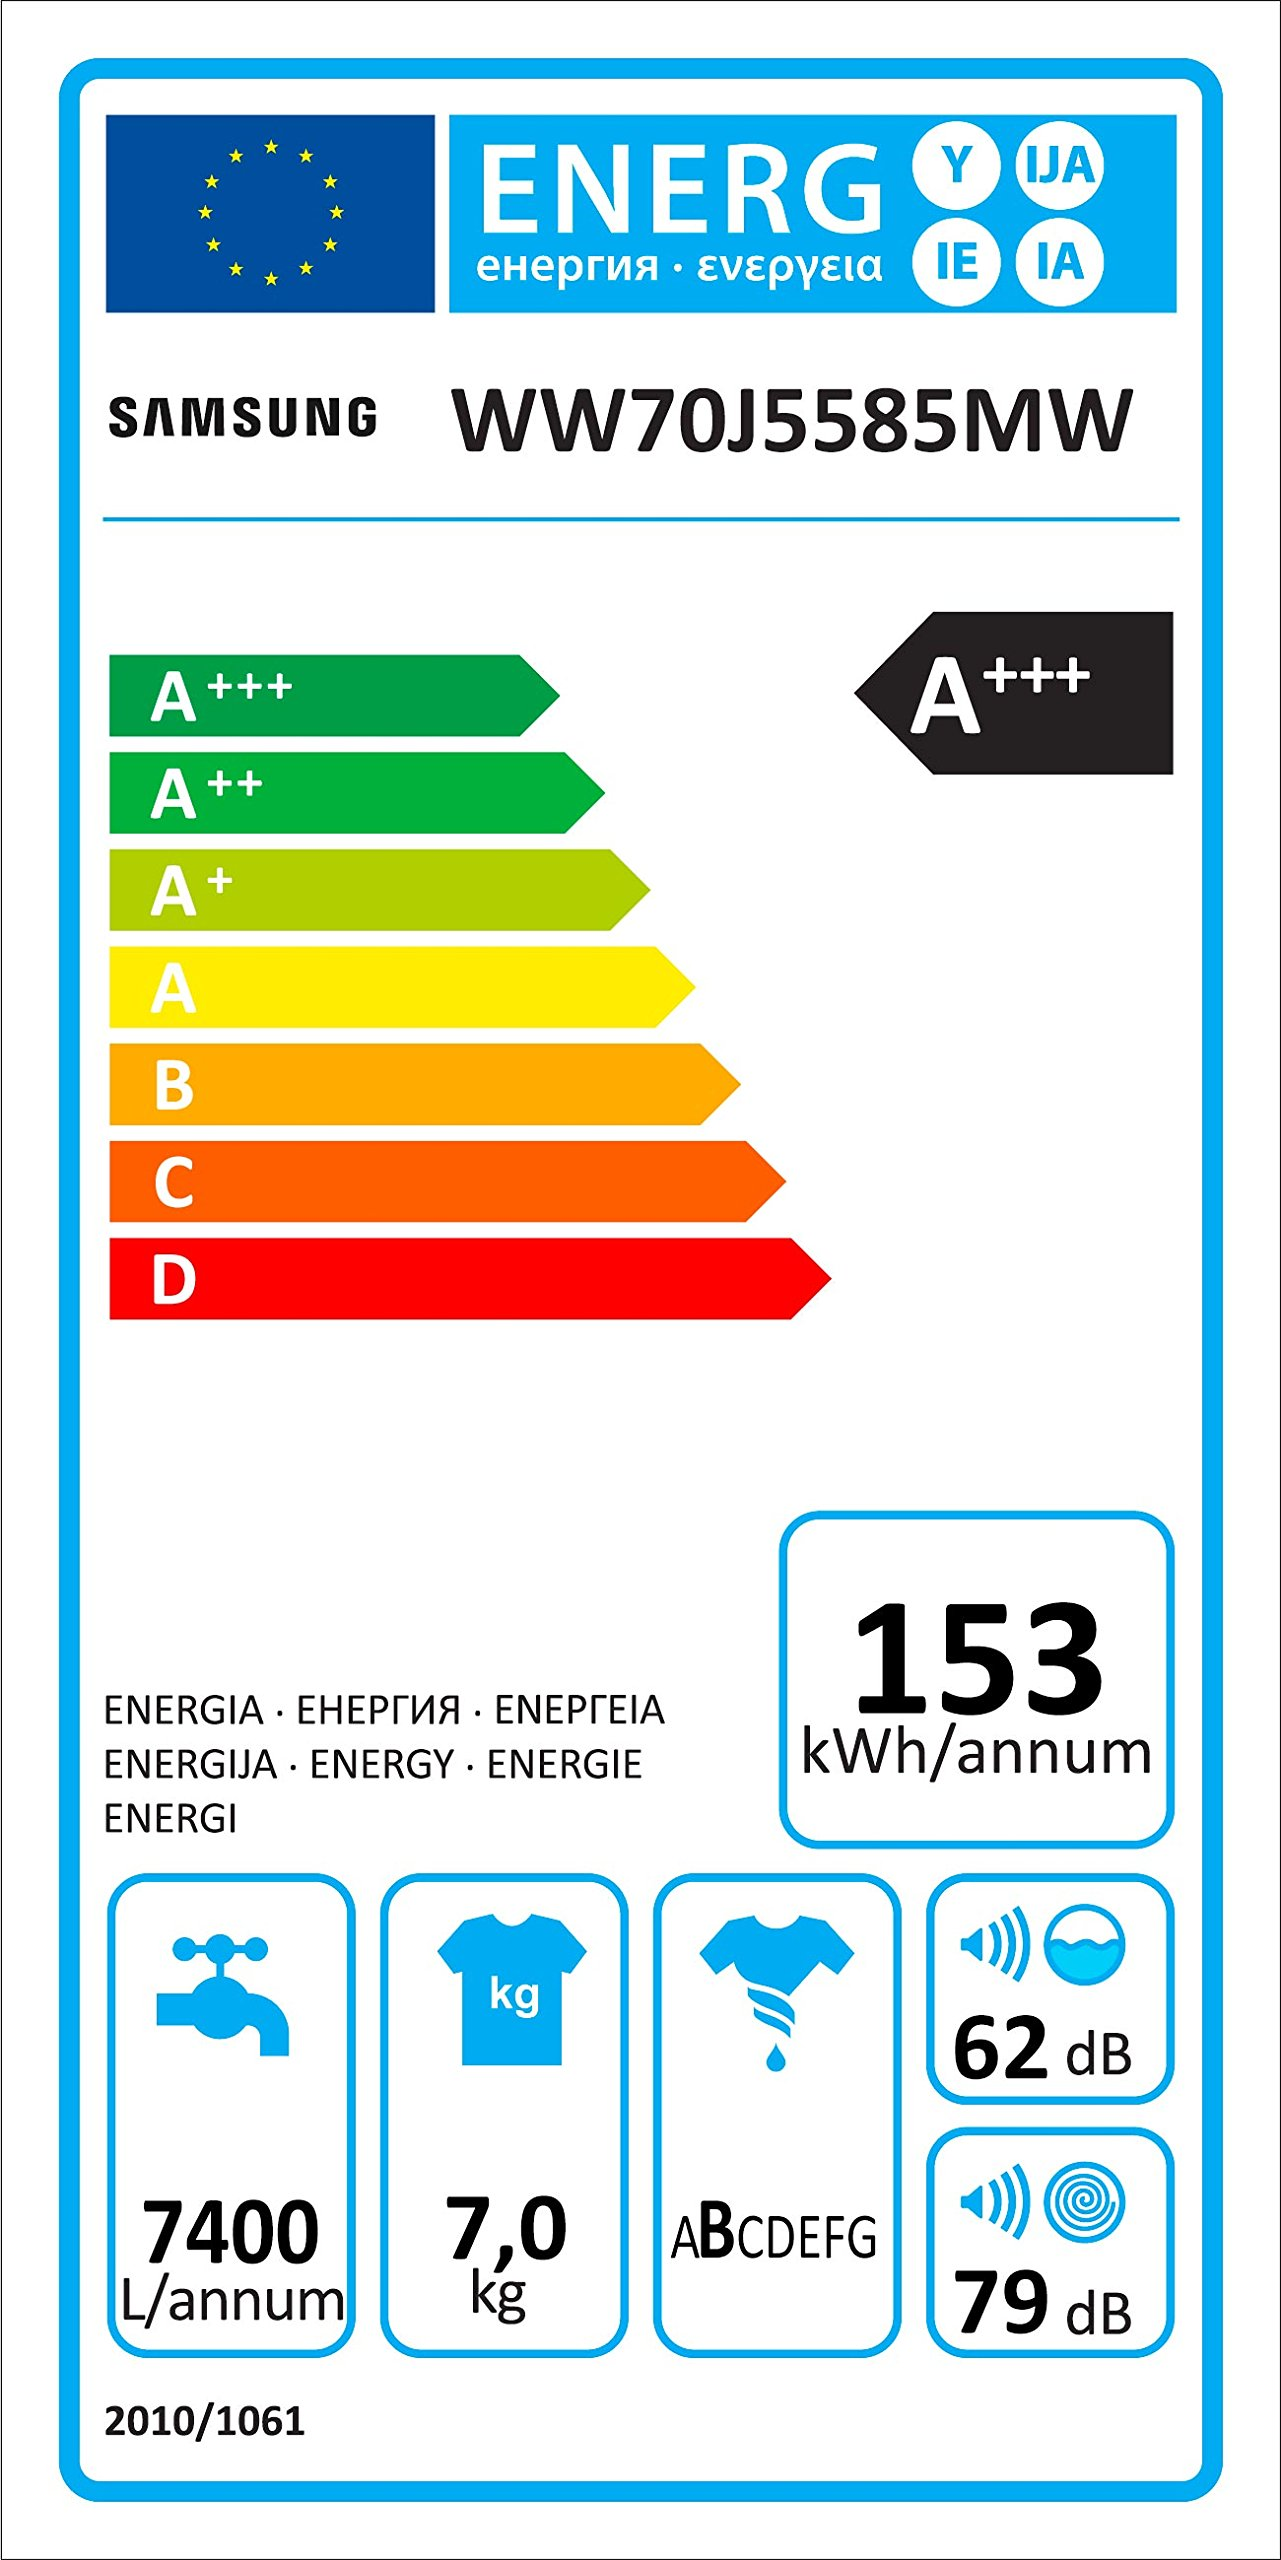 Samsung-WW70J5585MWEG-Waschmaschine-Frontlader-7kg-Automatikprogramme-SchaumAktiv-Technologie-FleckenIntensiv-85-cm-Hhe-Aquastop